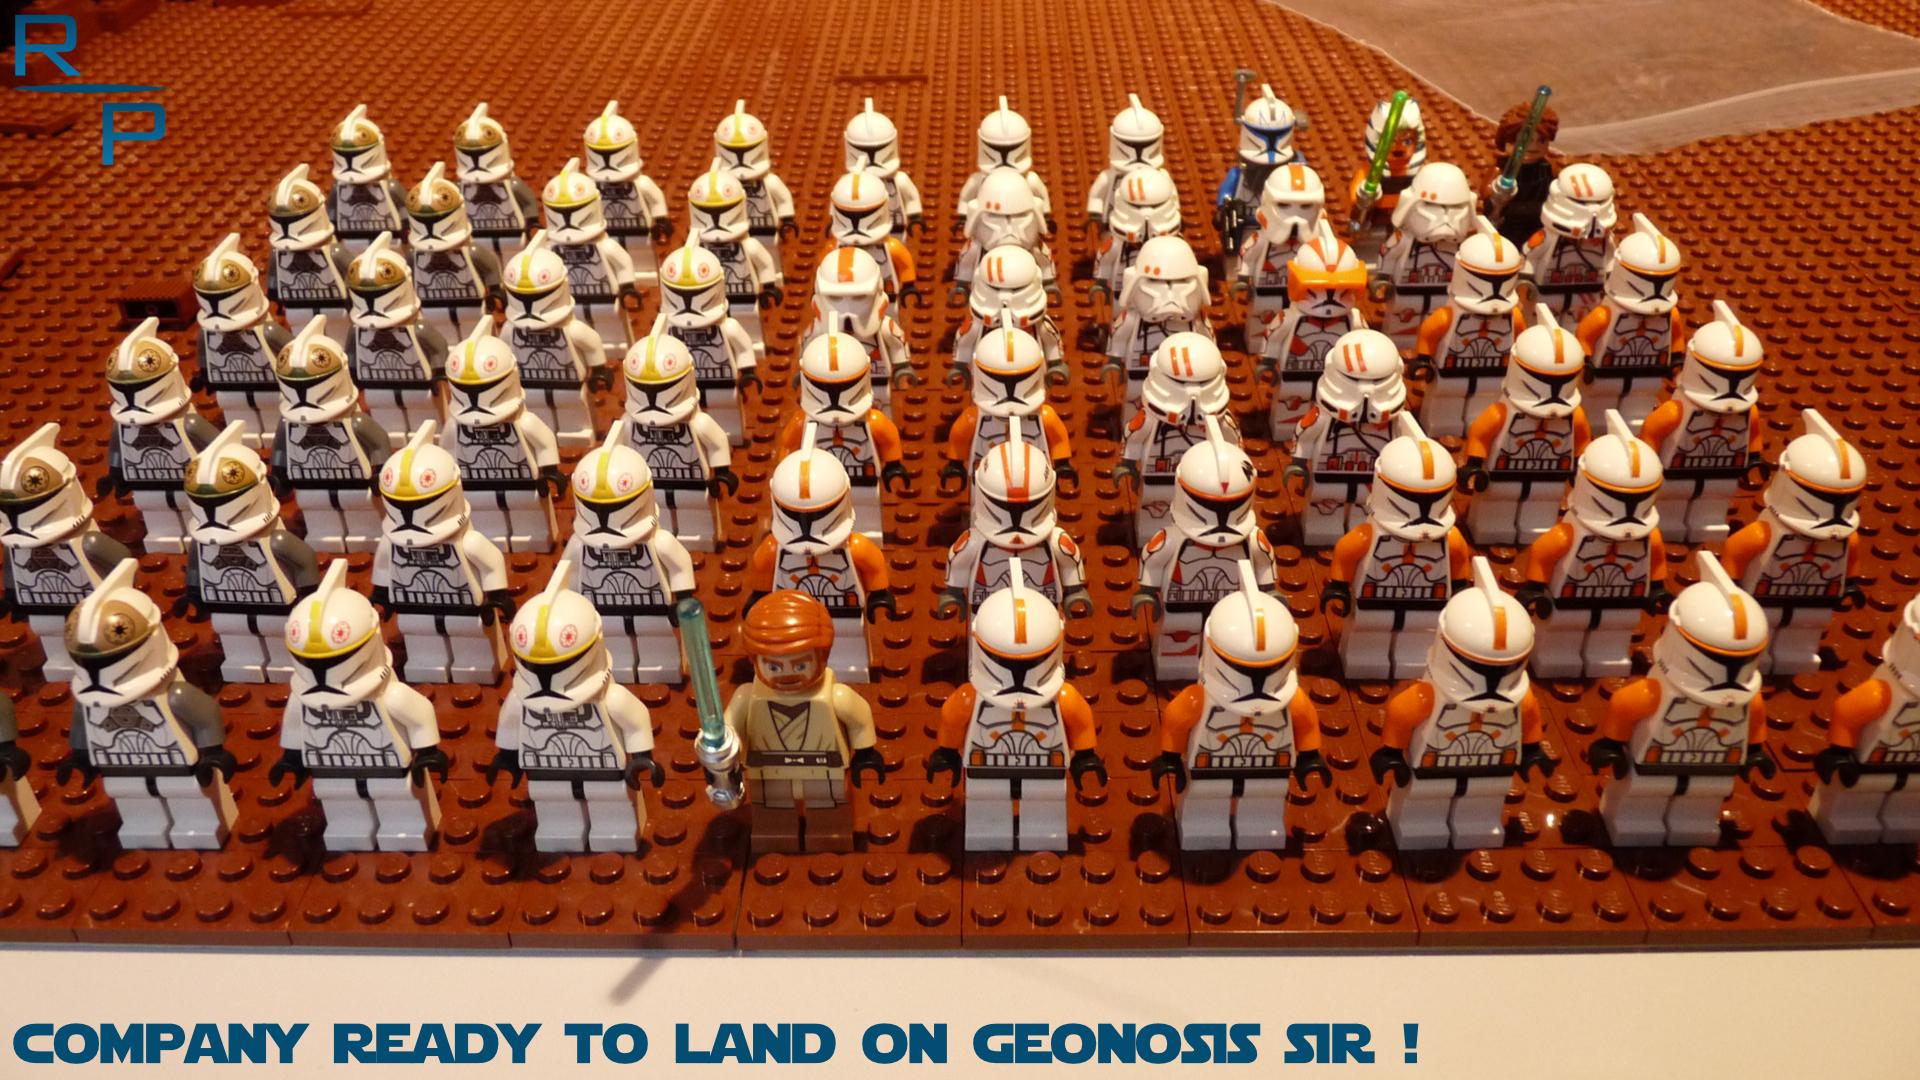 Wallpaper Star Big Lego Wip Battle Company Master Creation V3 501st Land Huge Second Ready Obi Anakin Wars Cody Wan Sir Rex Base Invasion Legion Ashoka Skywalker Boil Kenobi Tano Moc